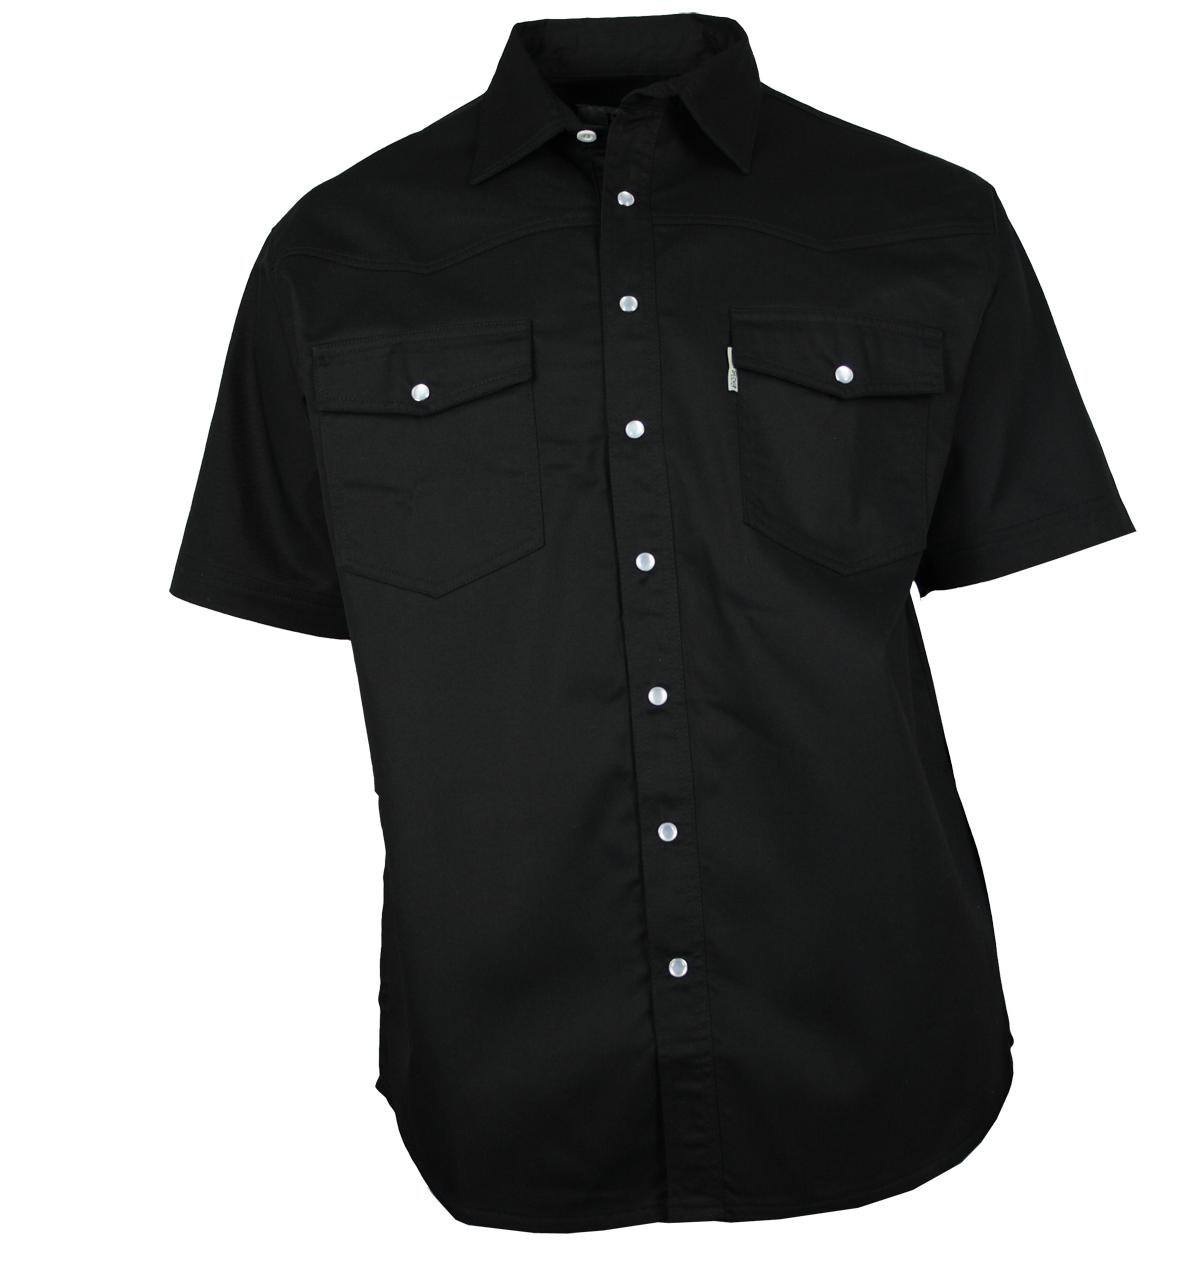 jeansartikel lederartikel strassartikel online kaufen western speicher jeanshemd kurzarm. Black Bedroom Furniture Sets. Home Design Ideas